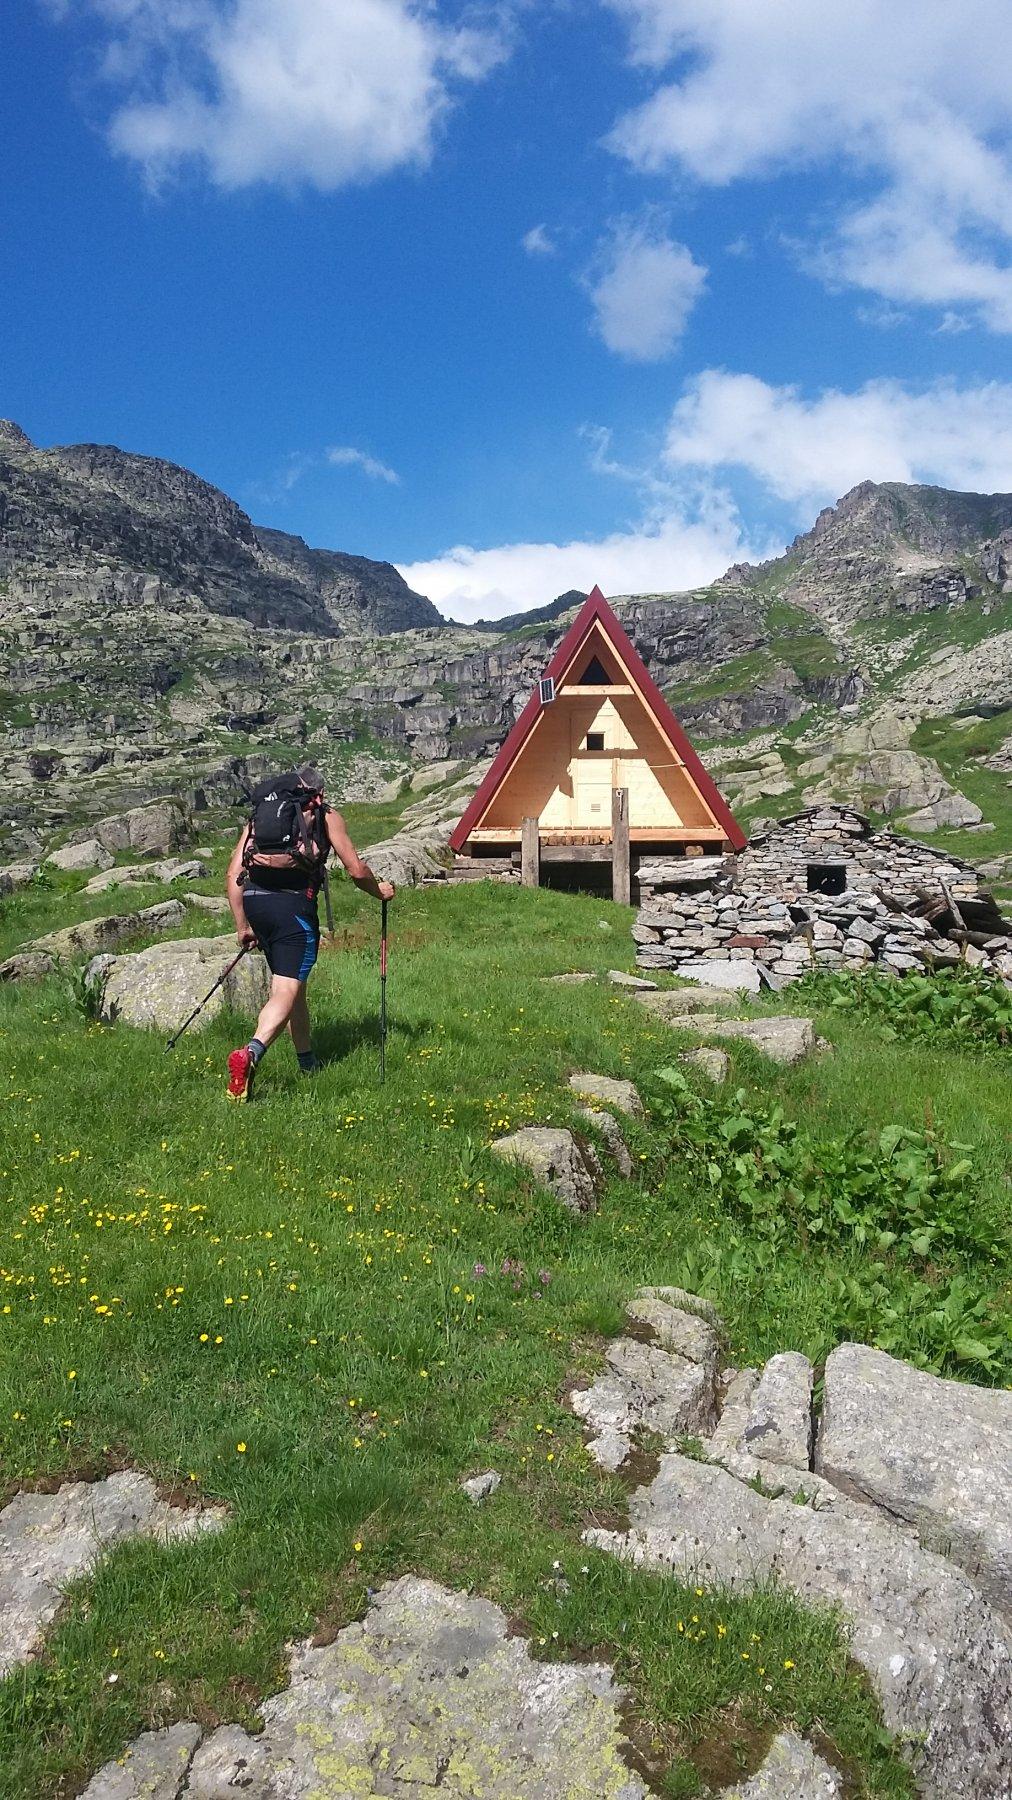 Nuovo bivacco all'Alpe Veilet